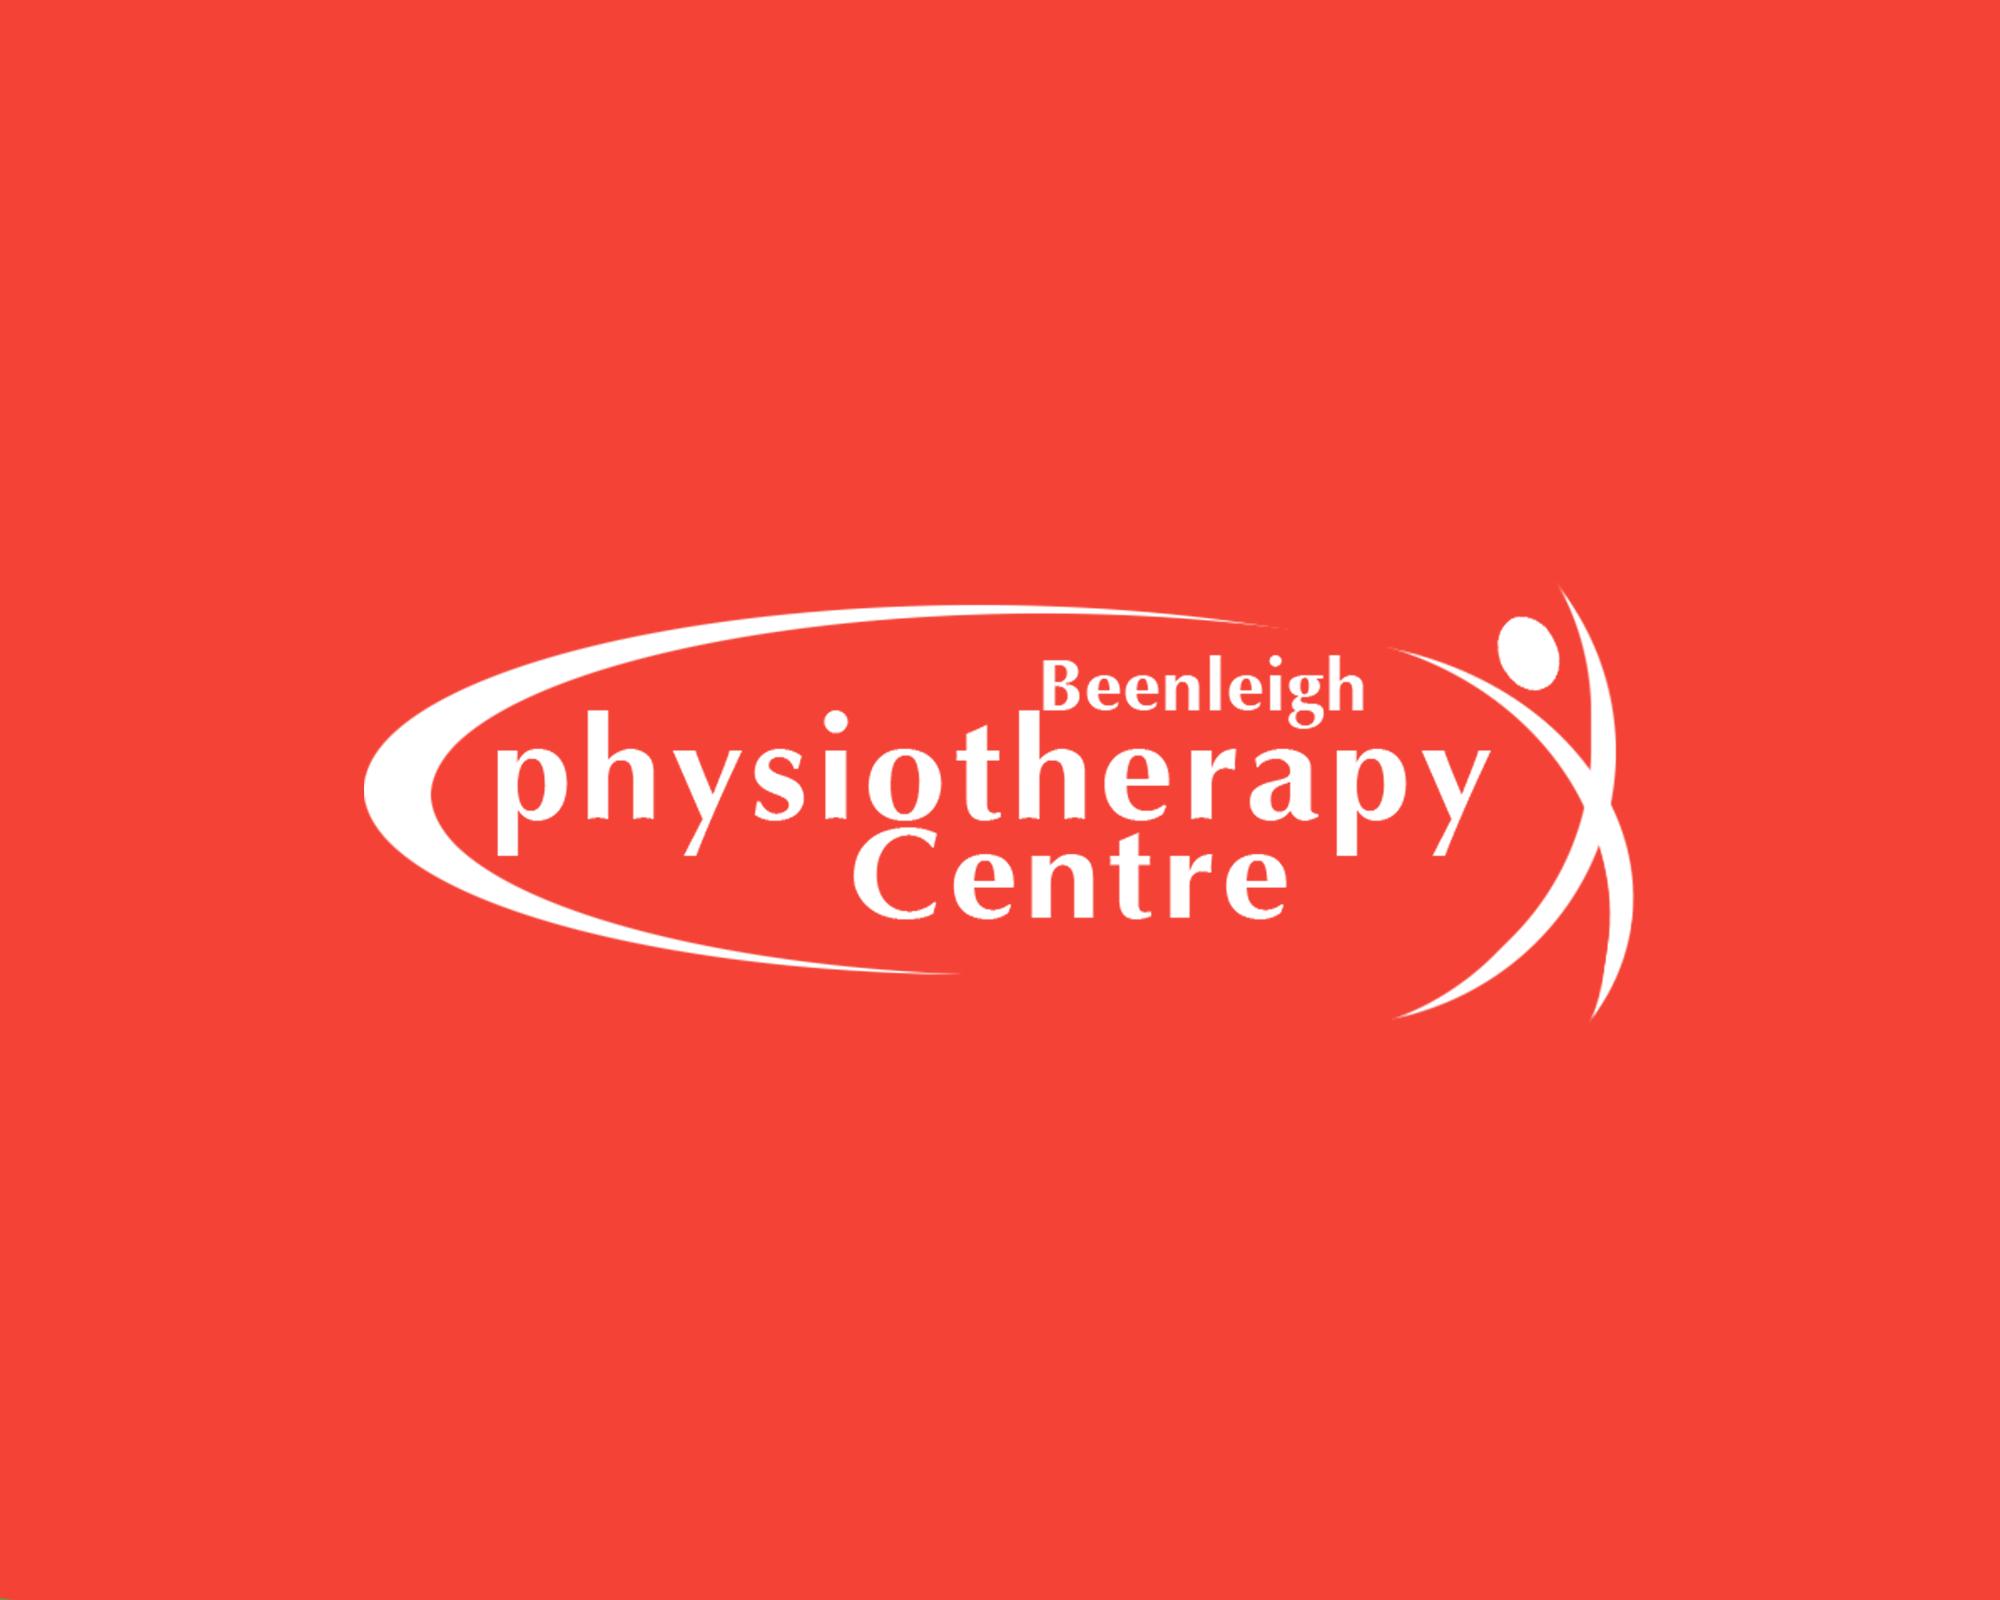 beenleigh physio Logo